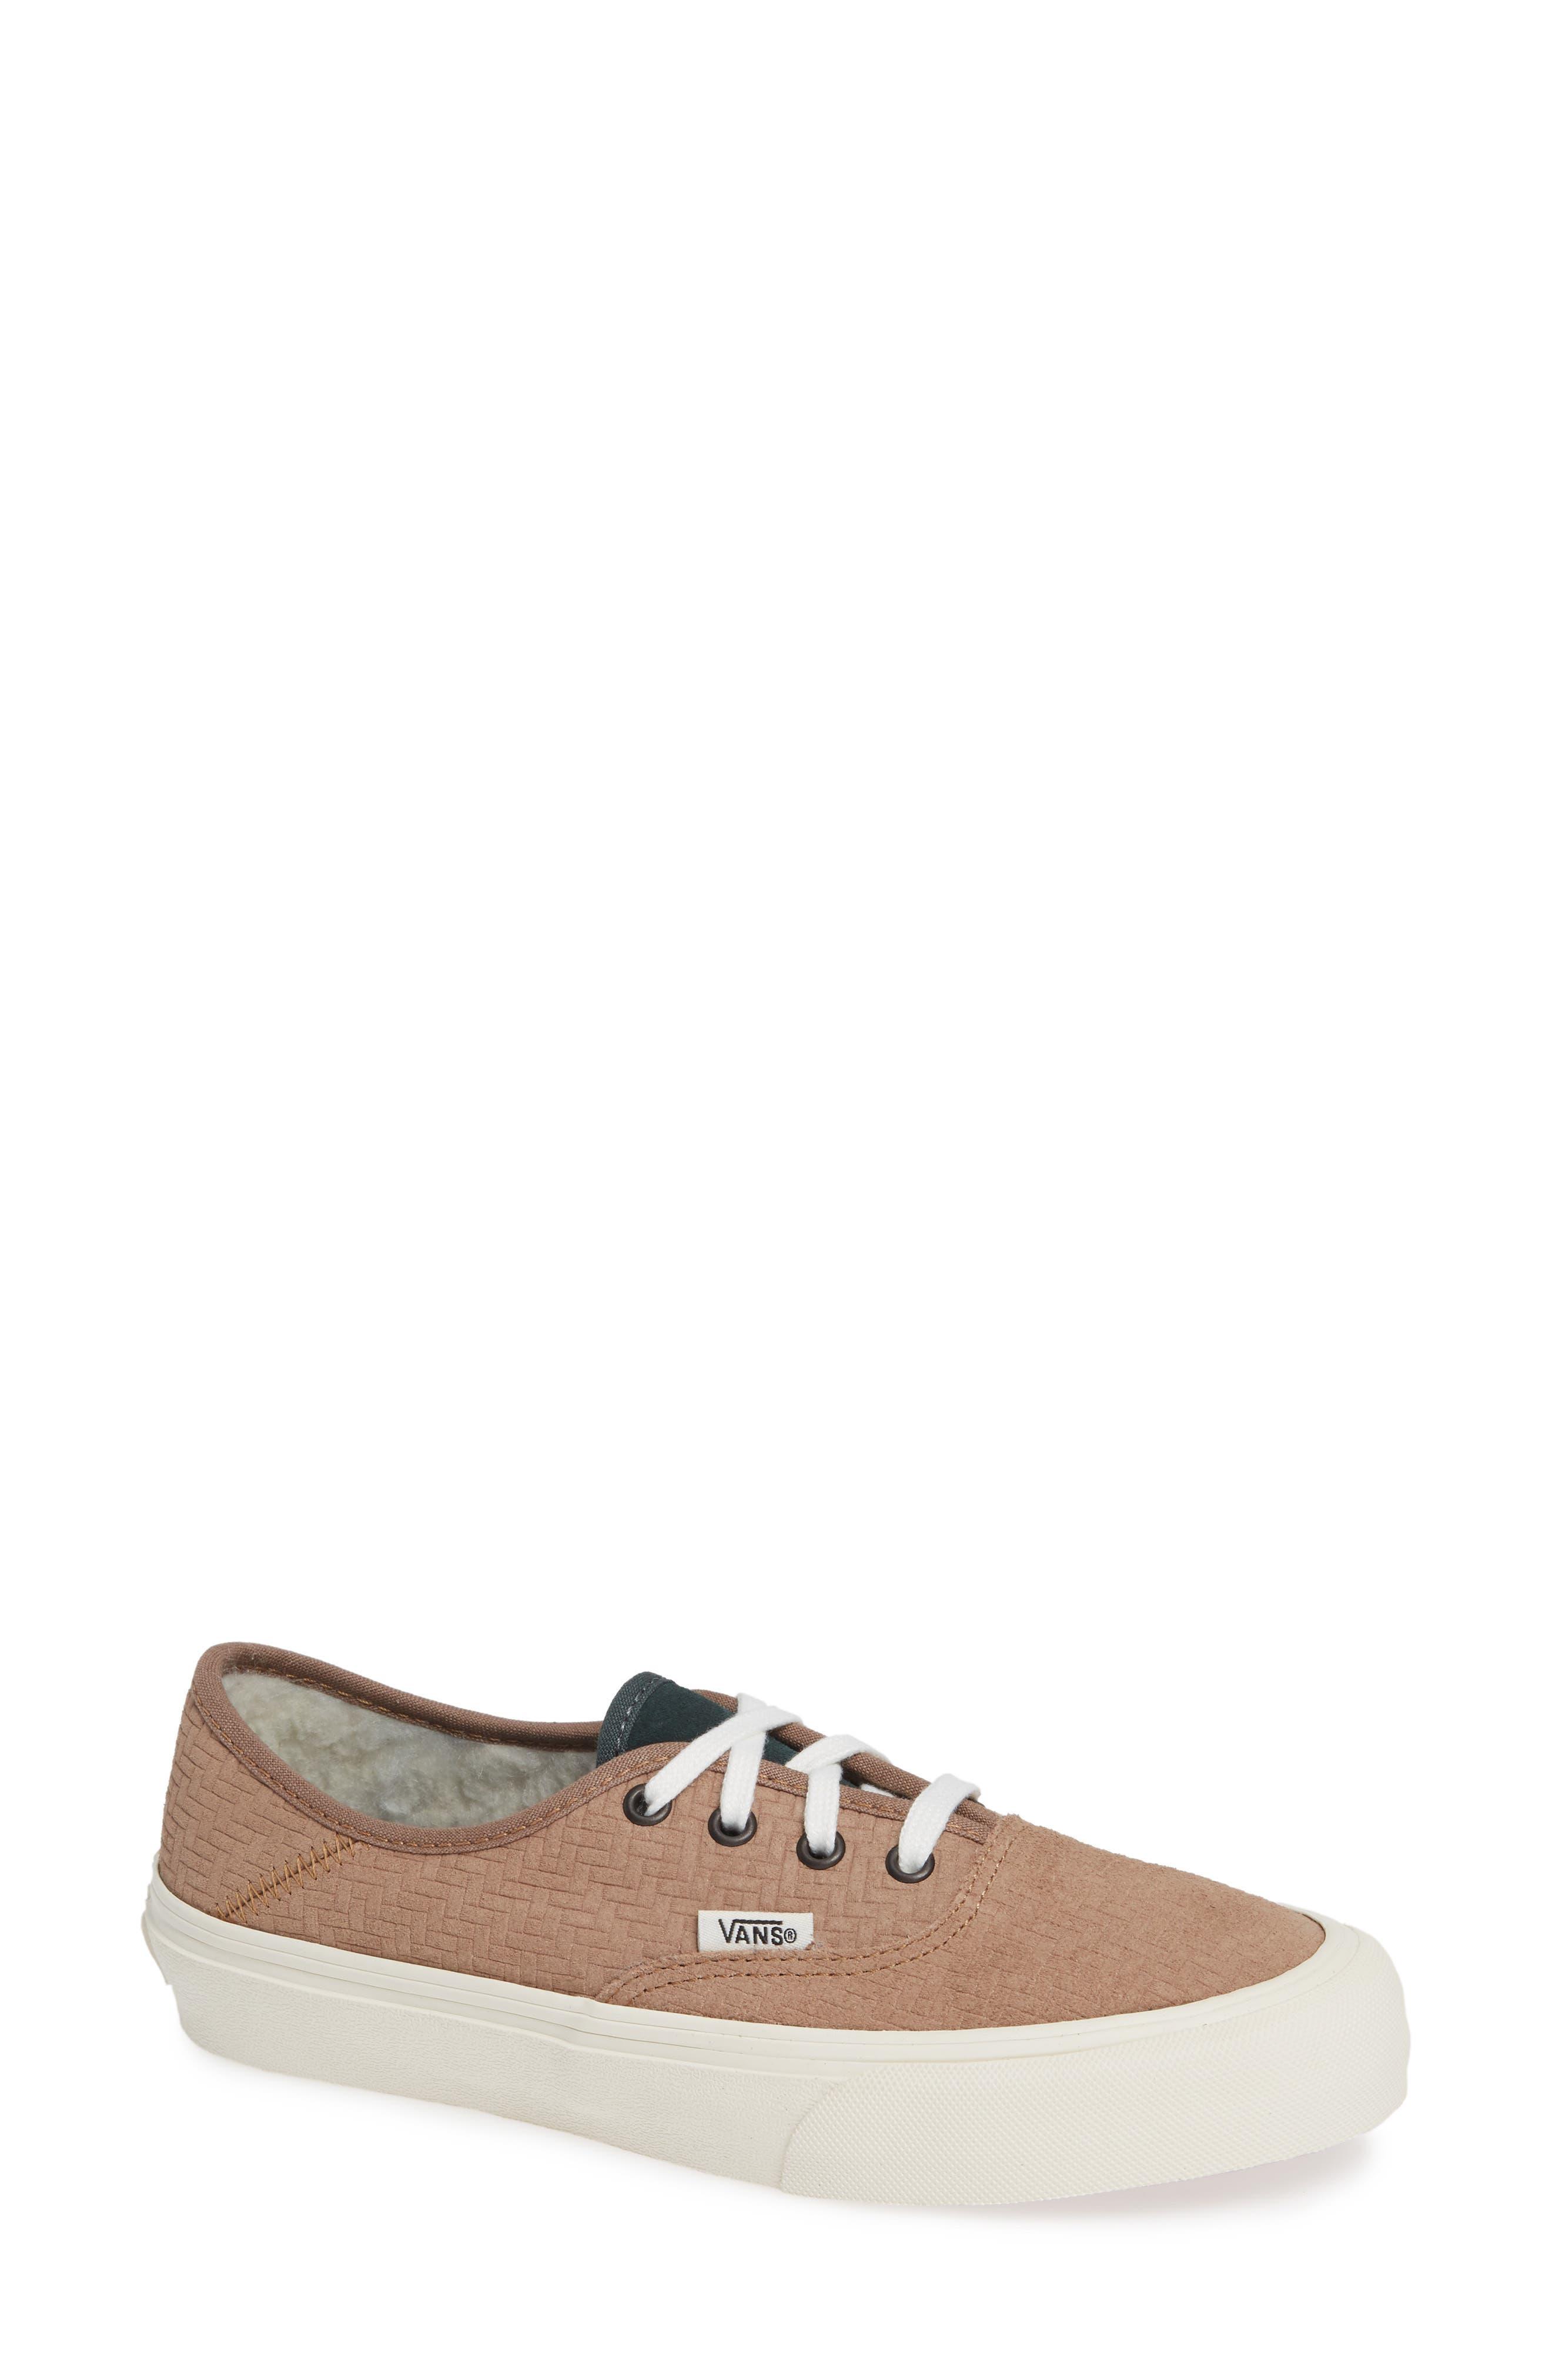 UA Authentic SF Collapsible Heel Sneaker, Main, color, WOODSMOKE/ DARKEST SPRUCE